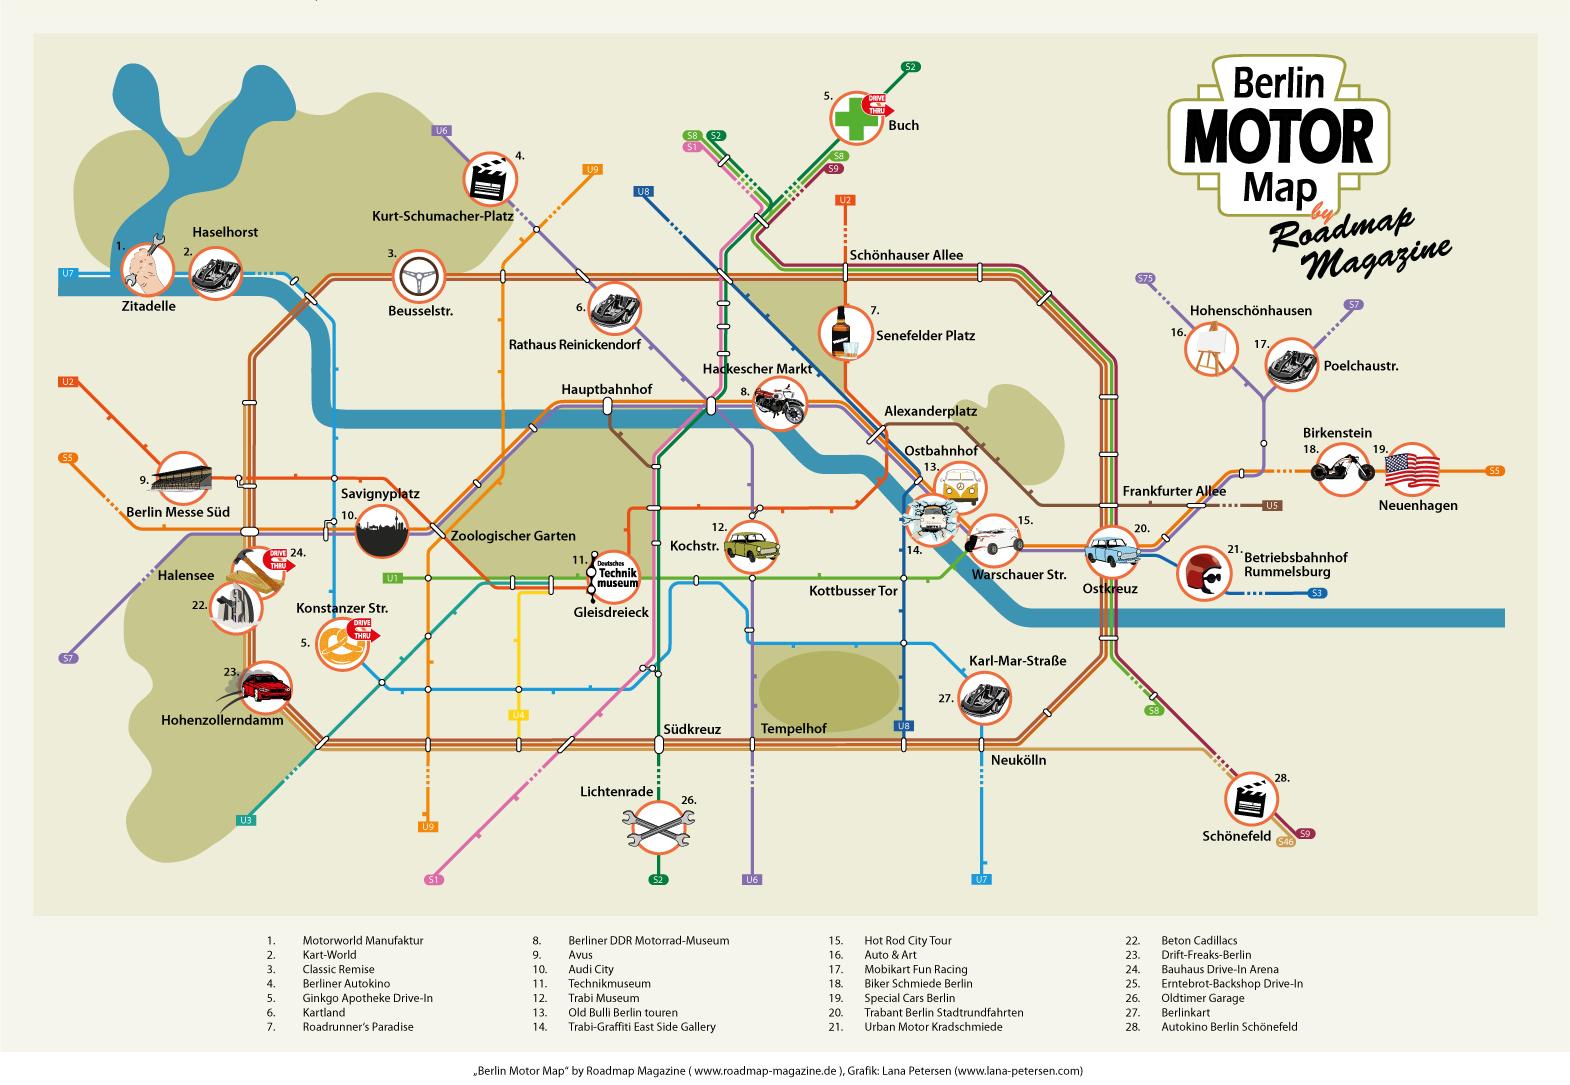 Berlin Motor Map